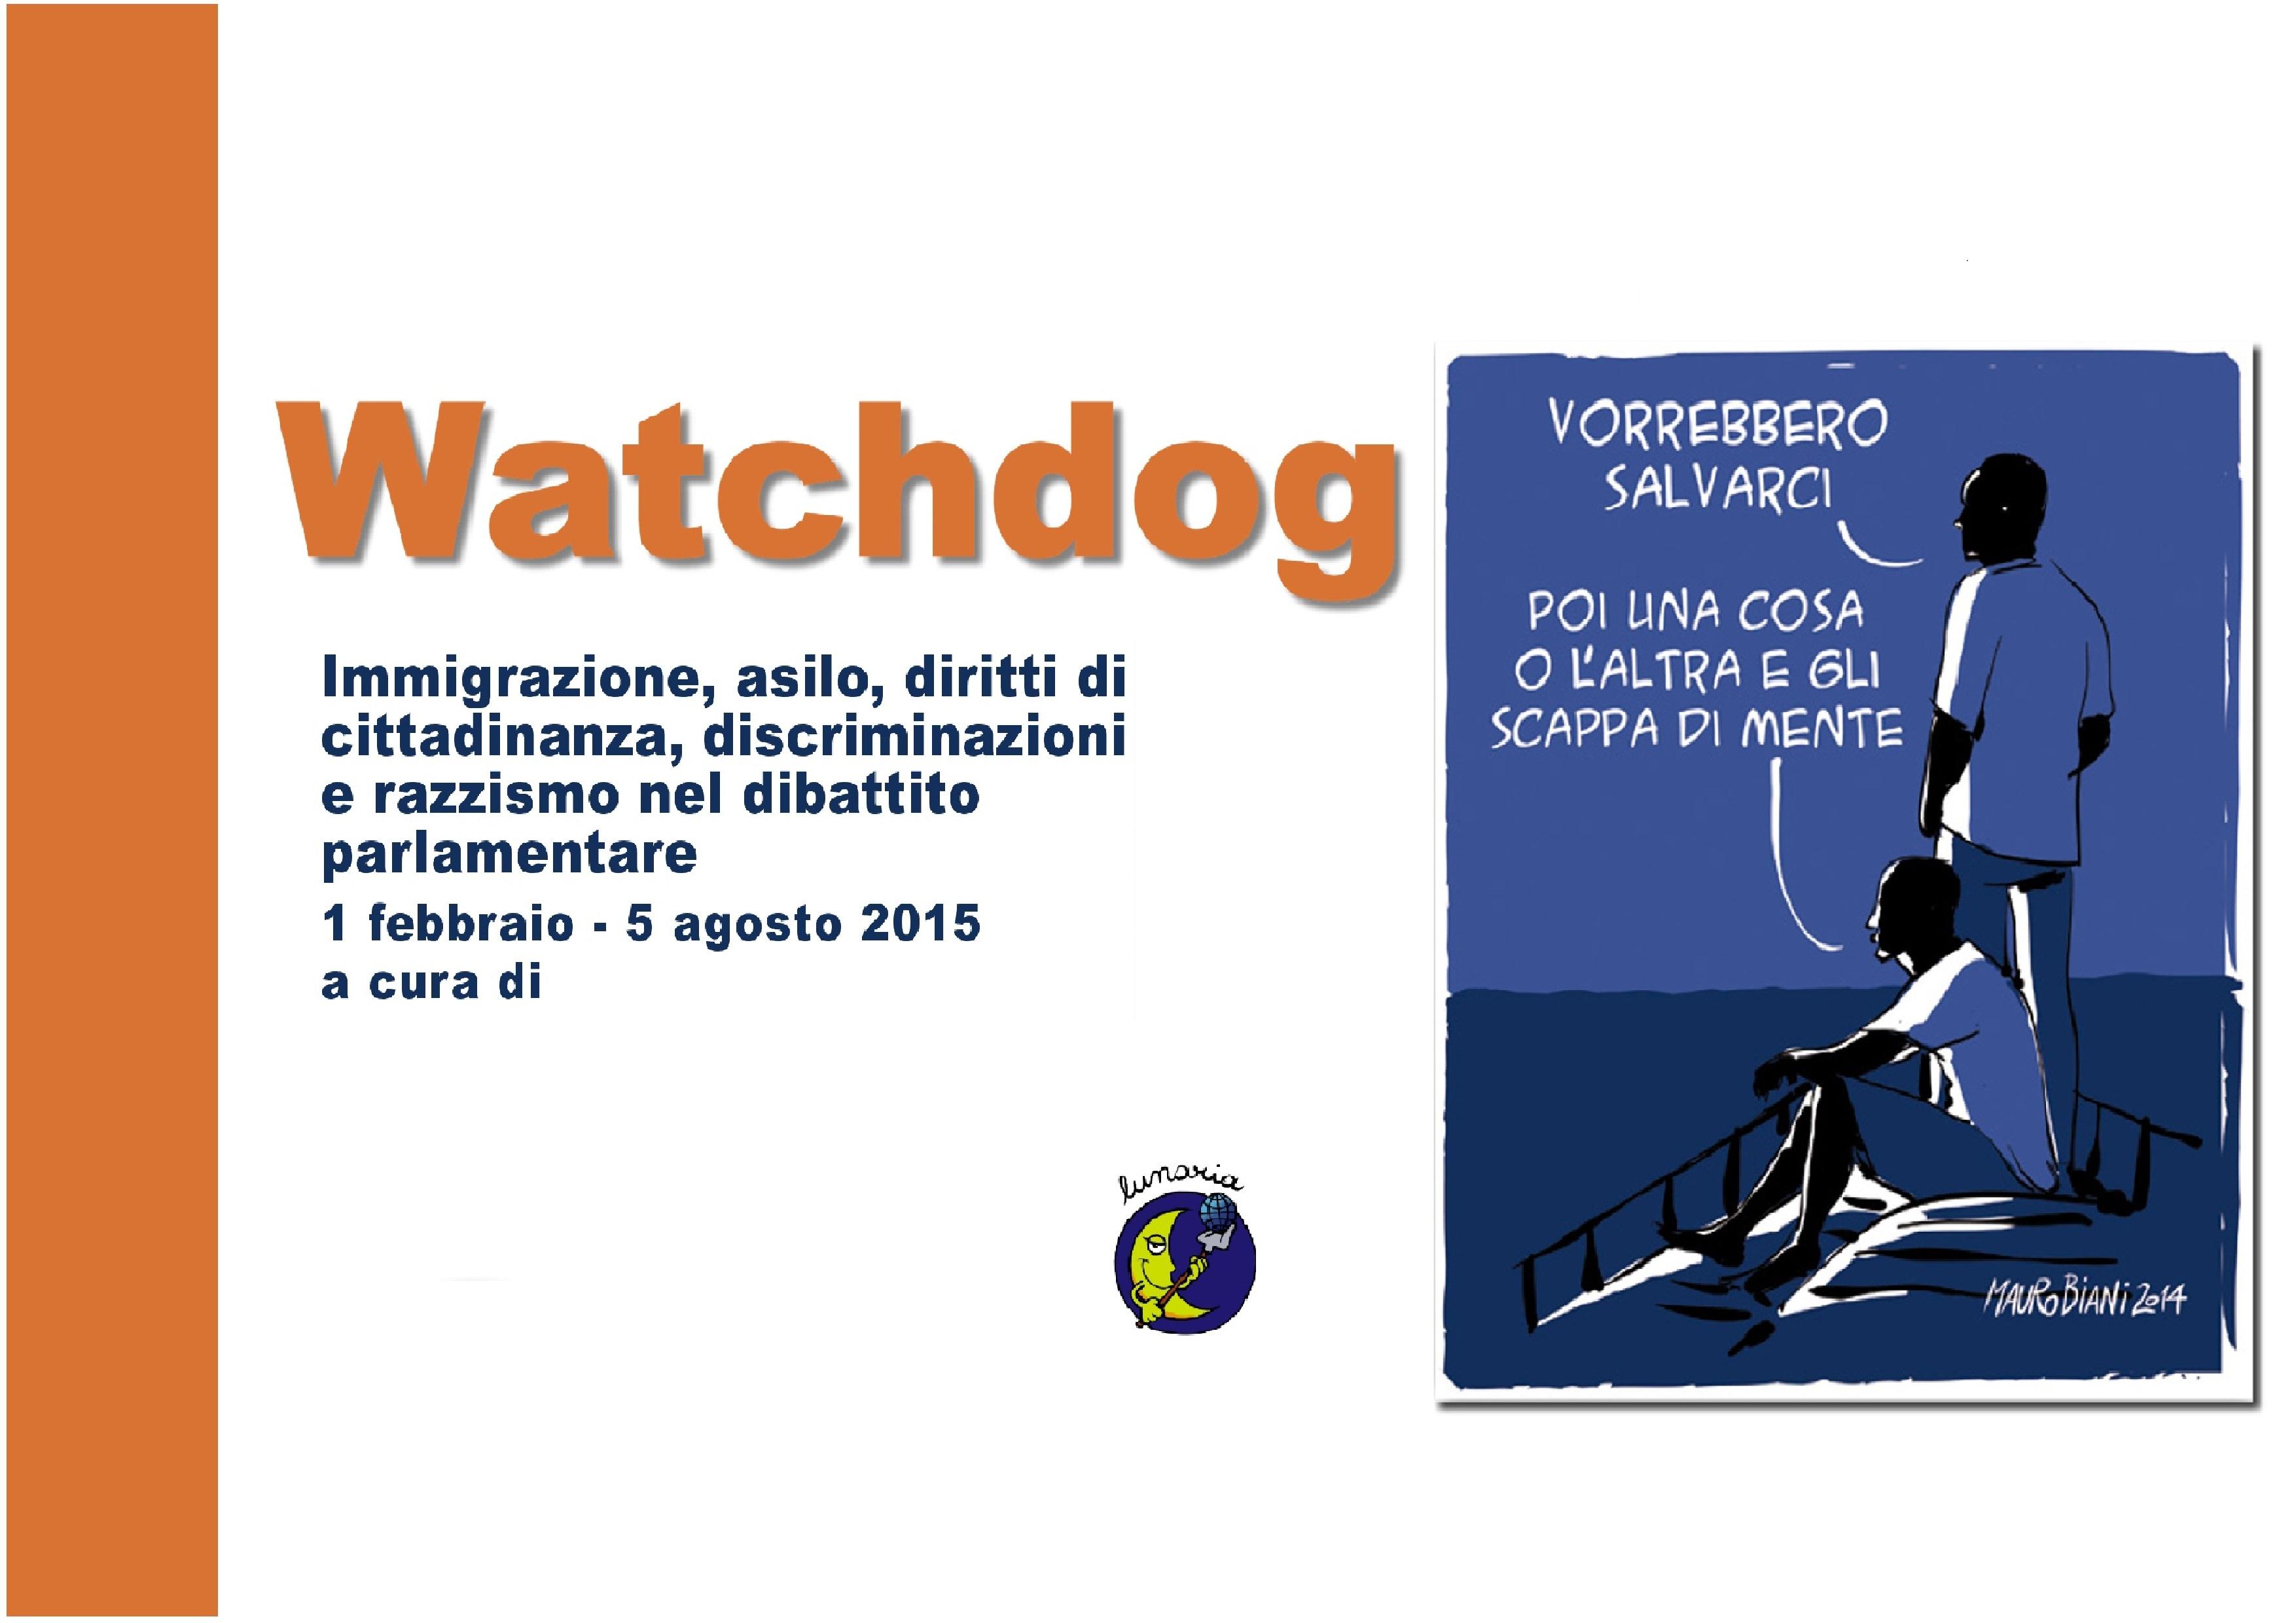 copertina-wacth-dog-orizzontale- B